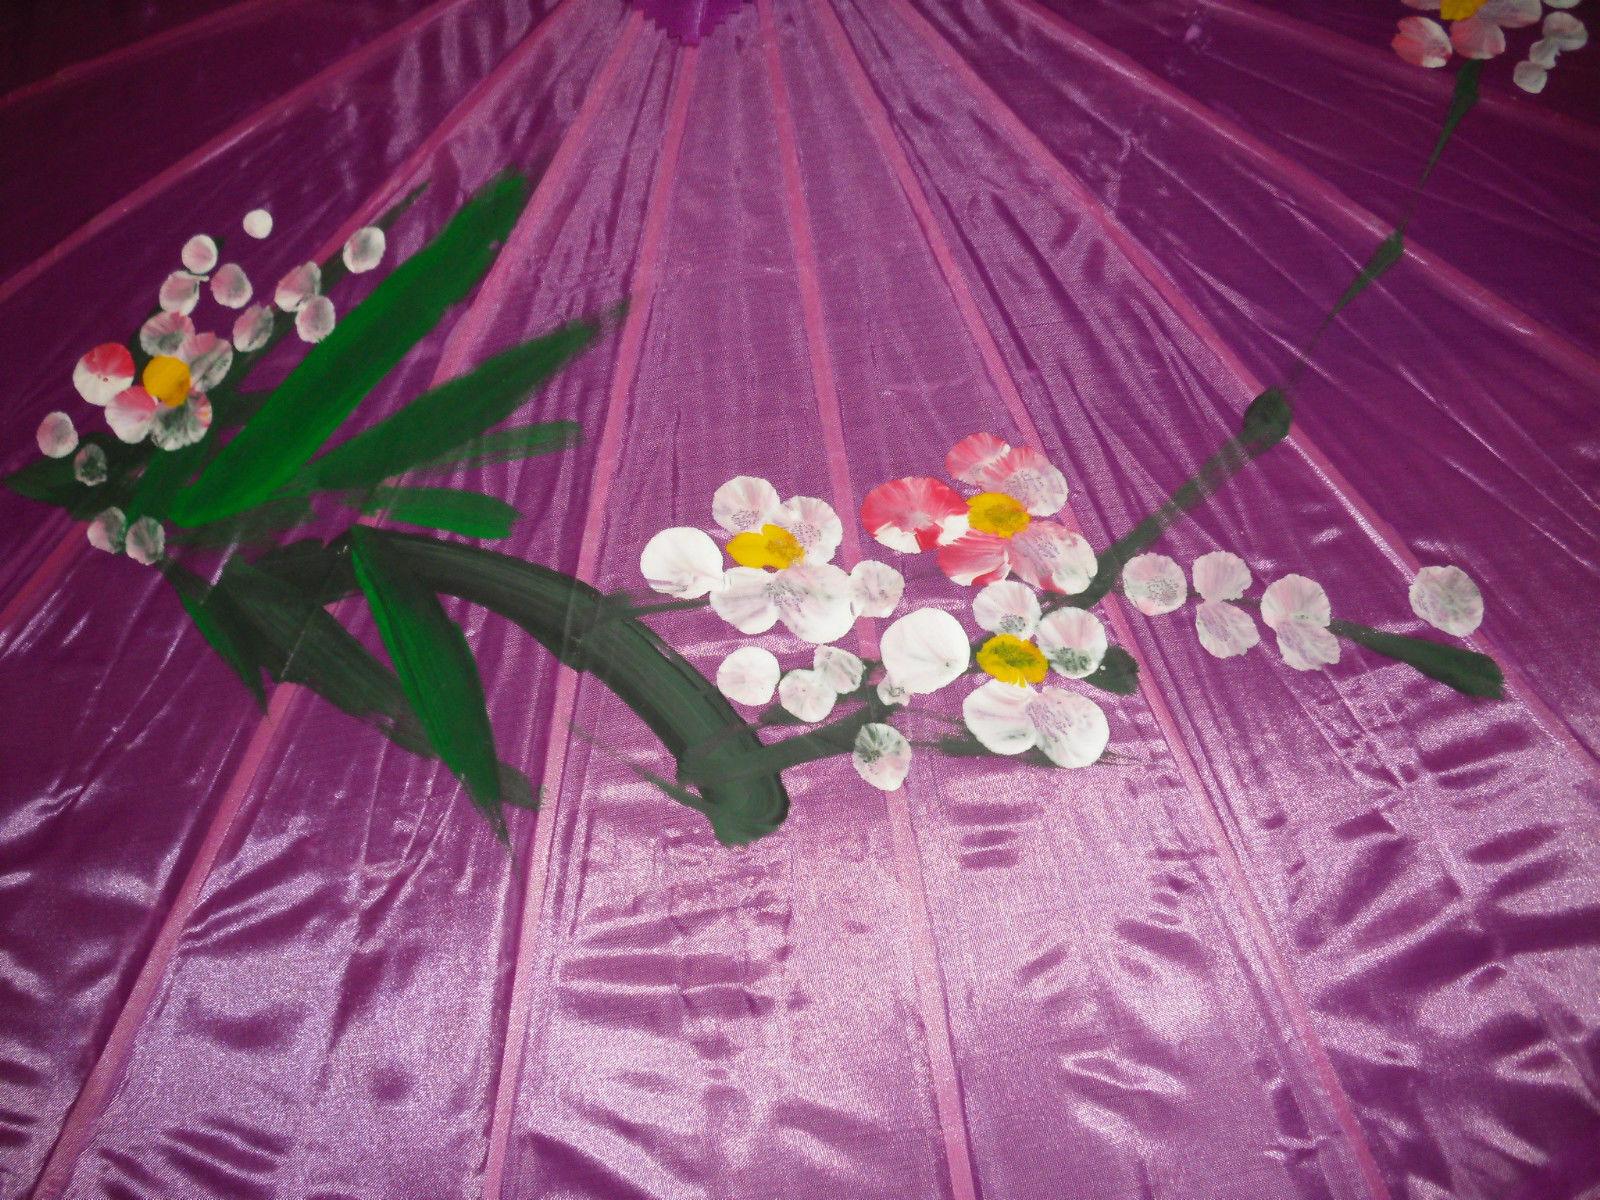 Joblot of 10 Chinese Silk & Bamboo Umbrella Parasol New Wholesale 5